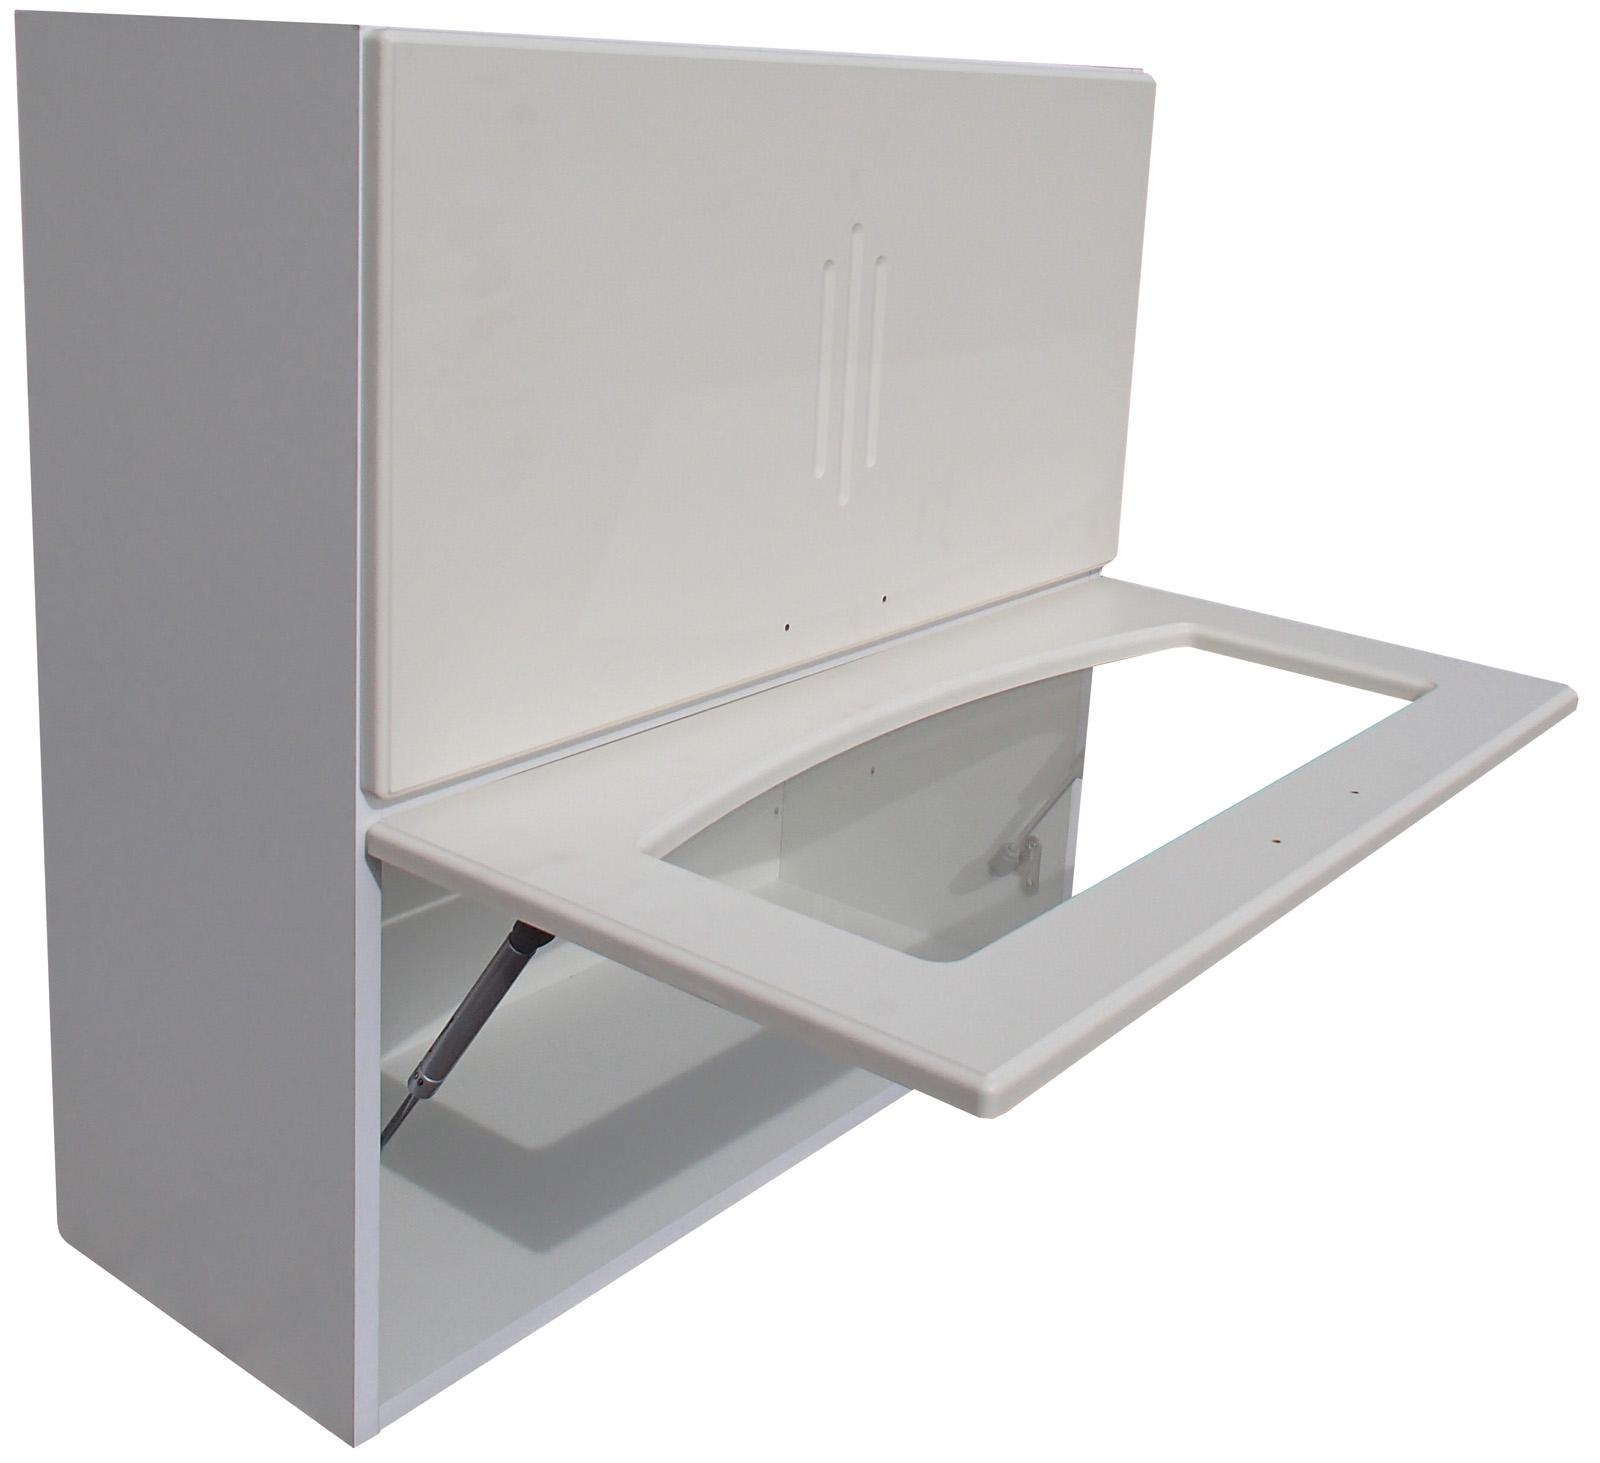 Horní dvojitý výklop 70x72 cm - bílý VÝPRODEJ